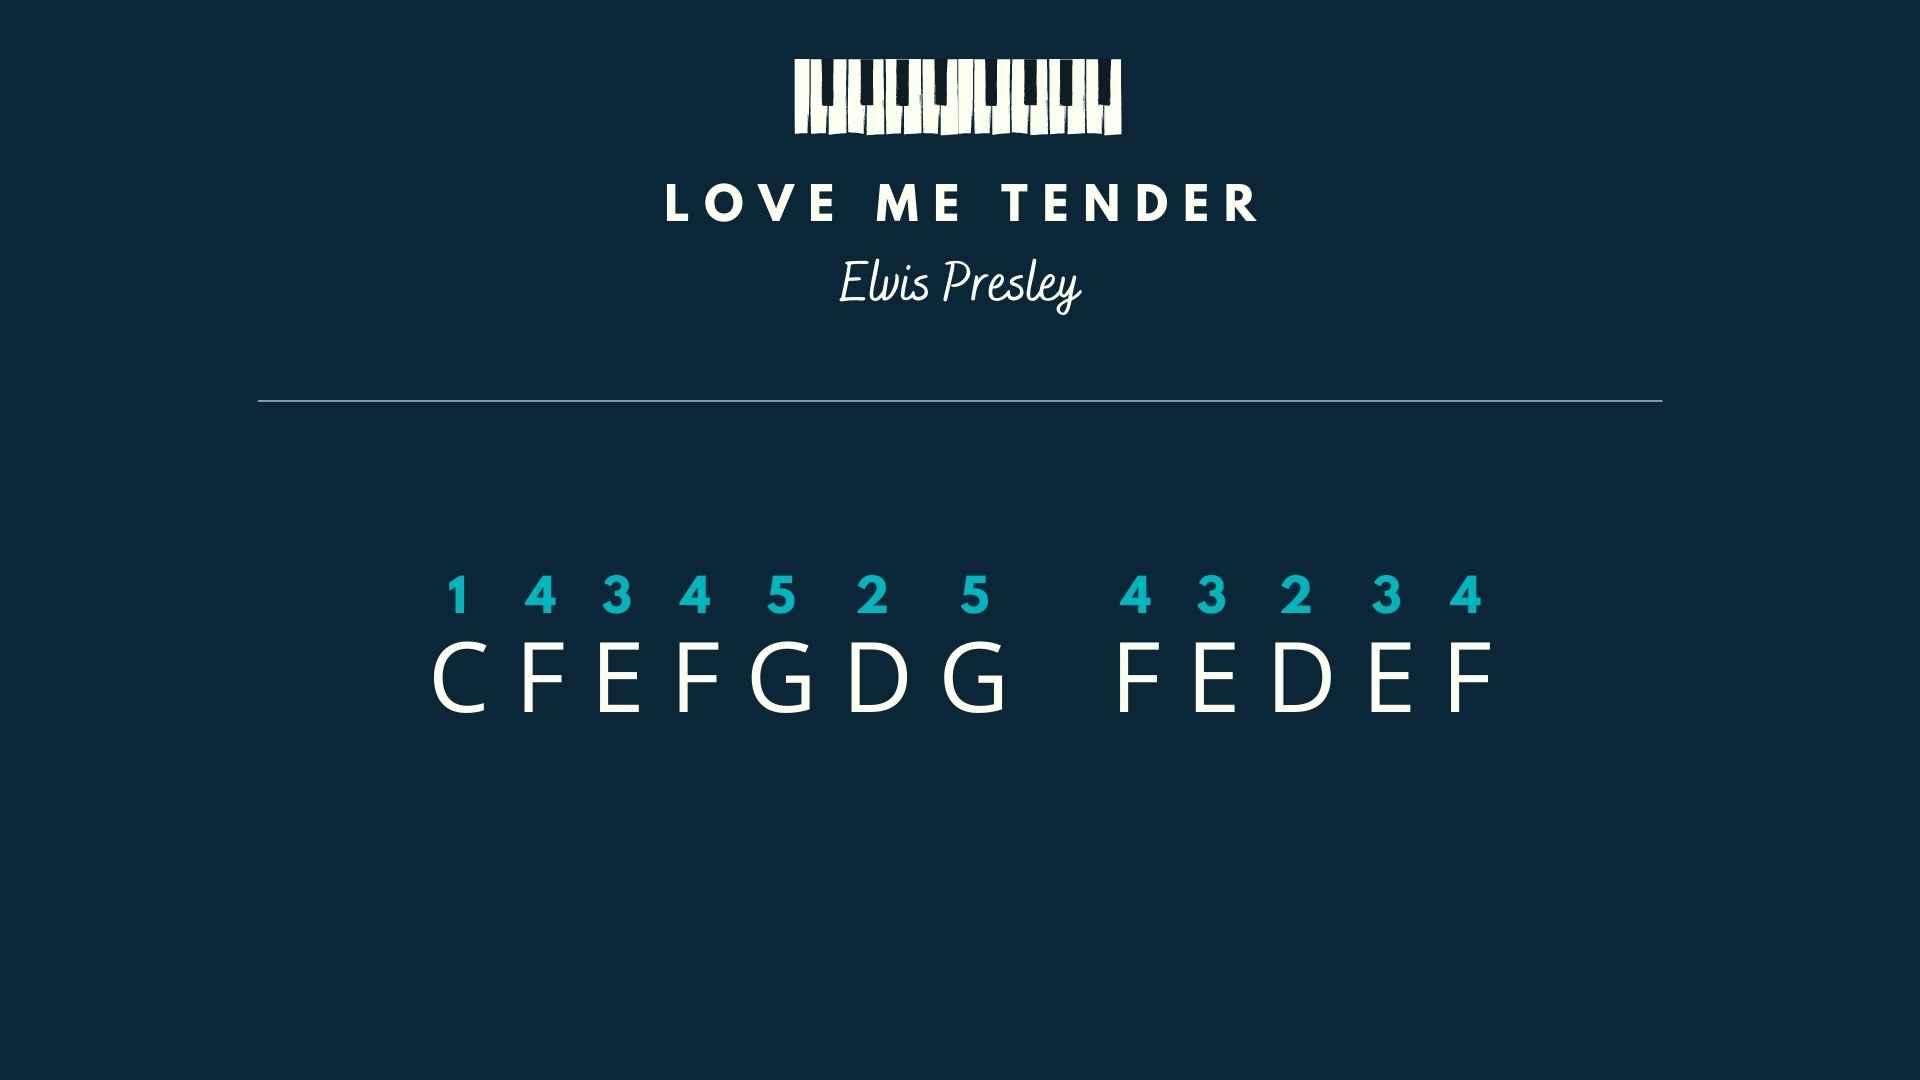 Love Me Tender melody